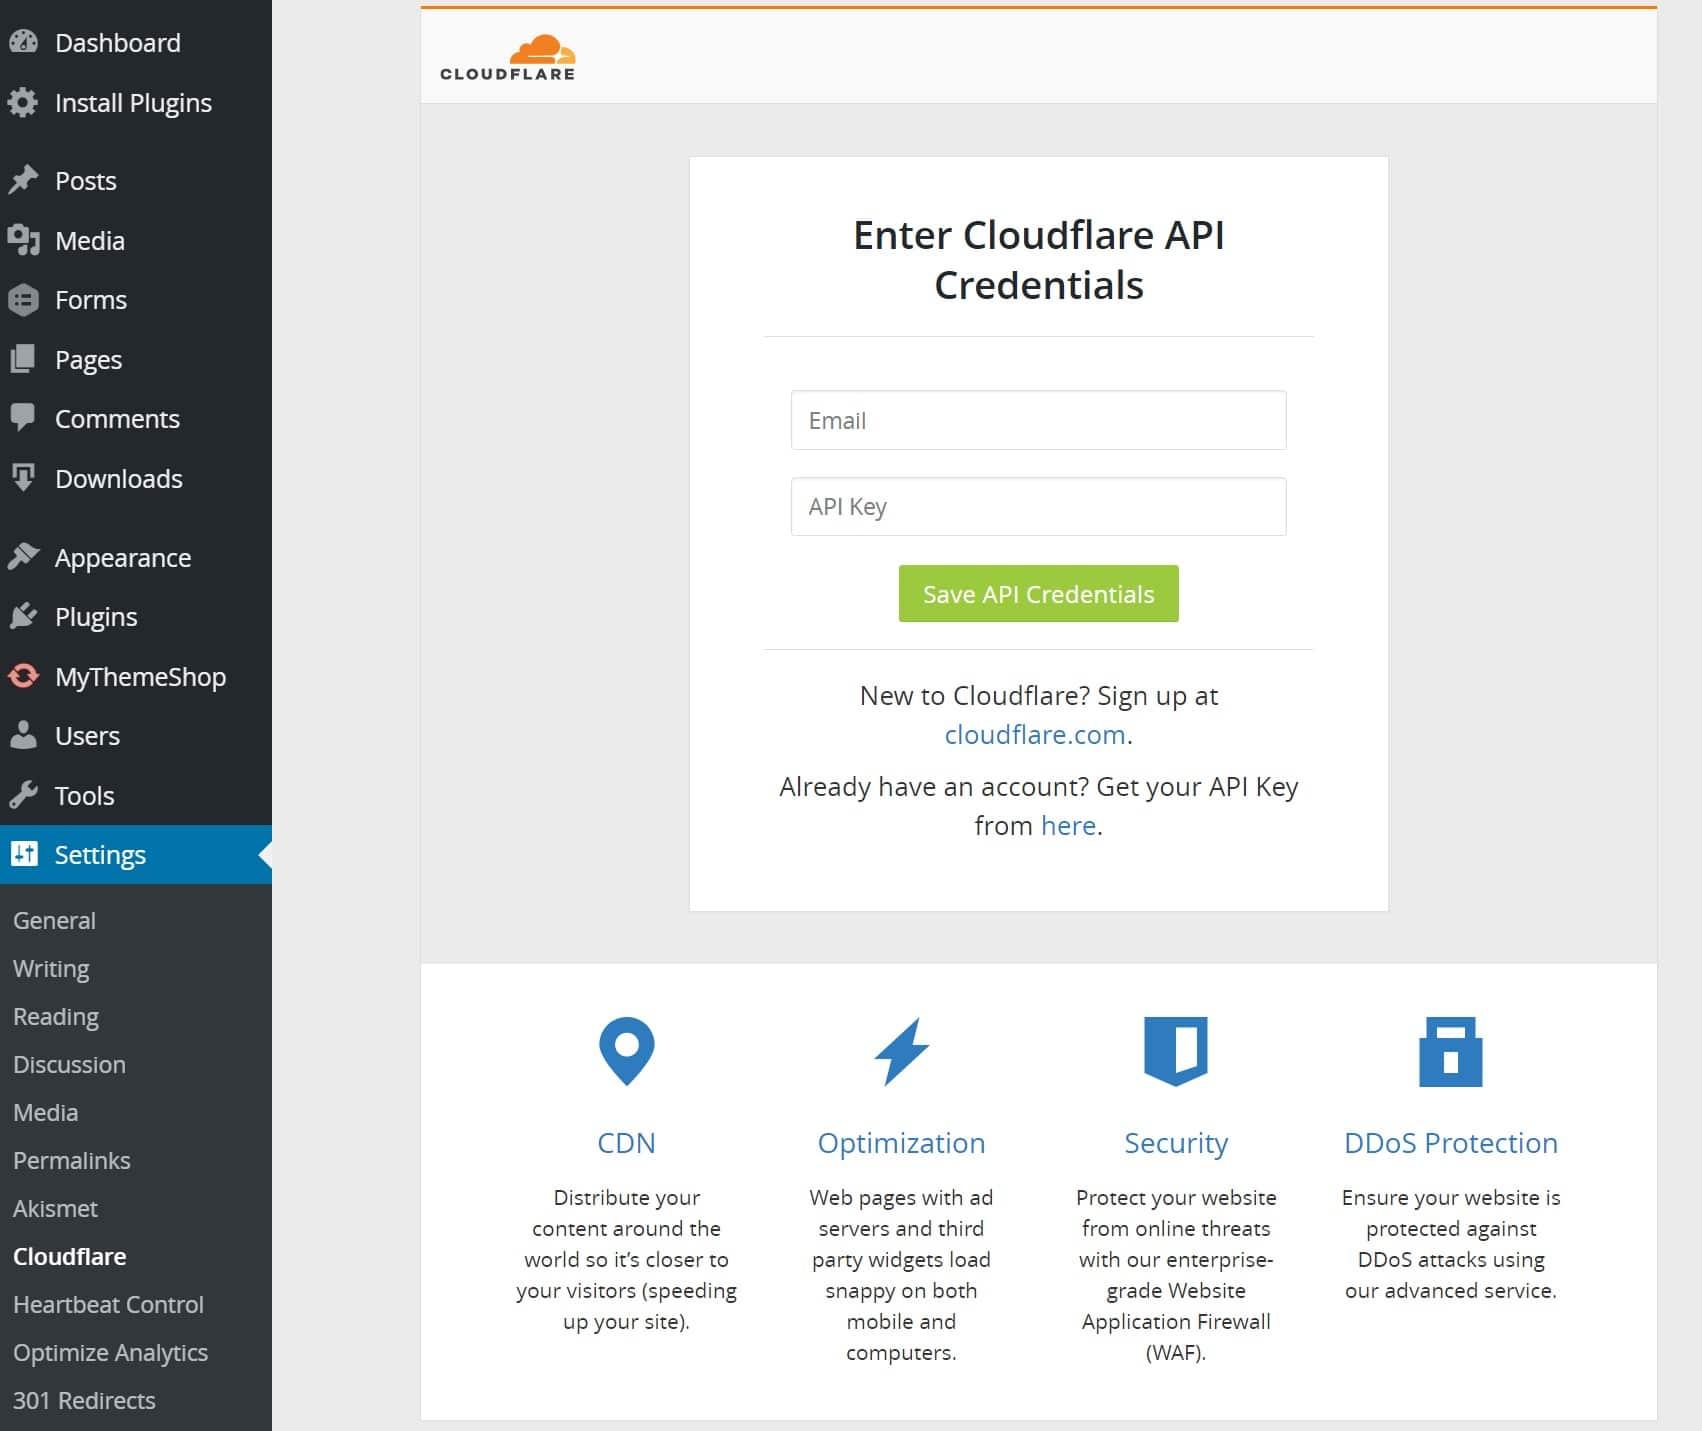 Cloudflare-WordPress-Plugin API-Anmeldeinformationen